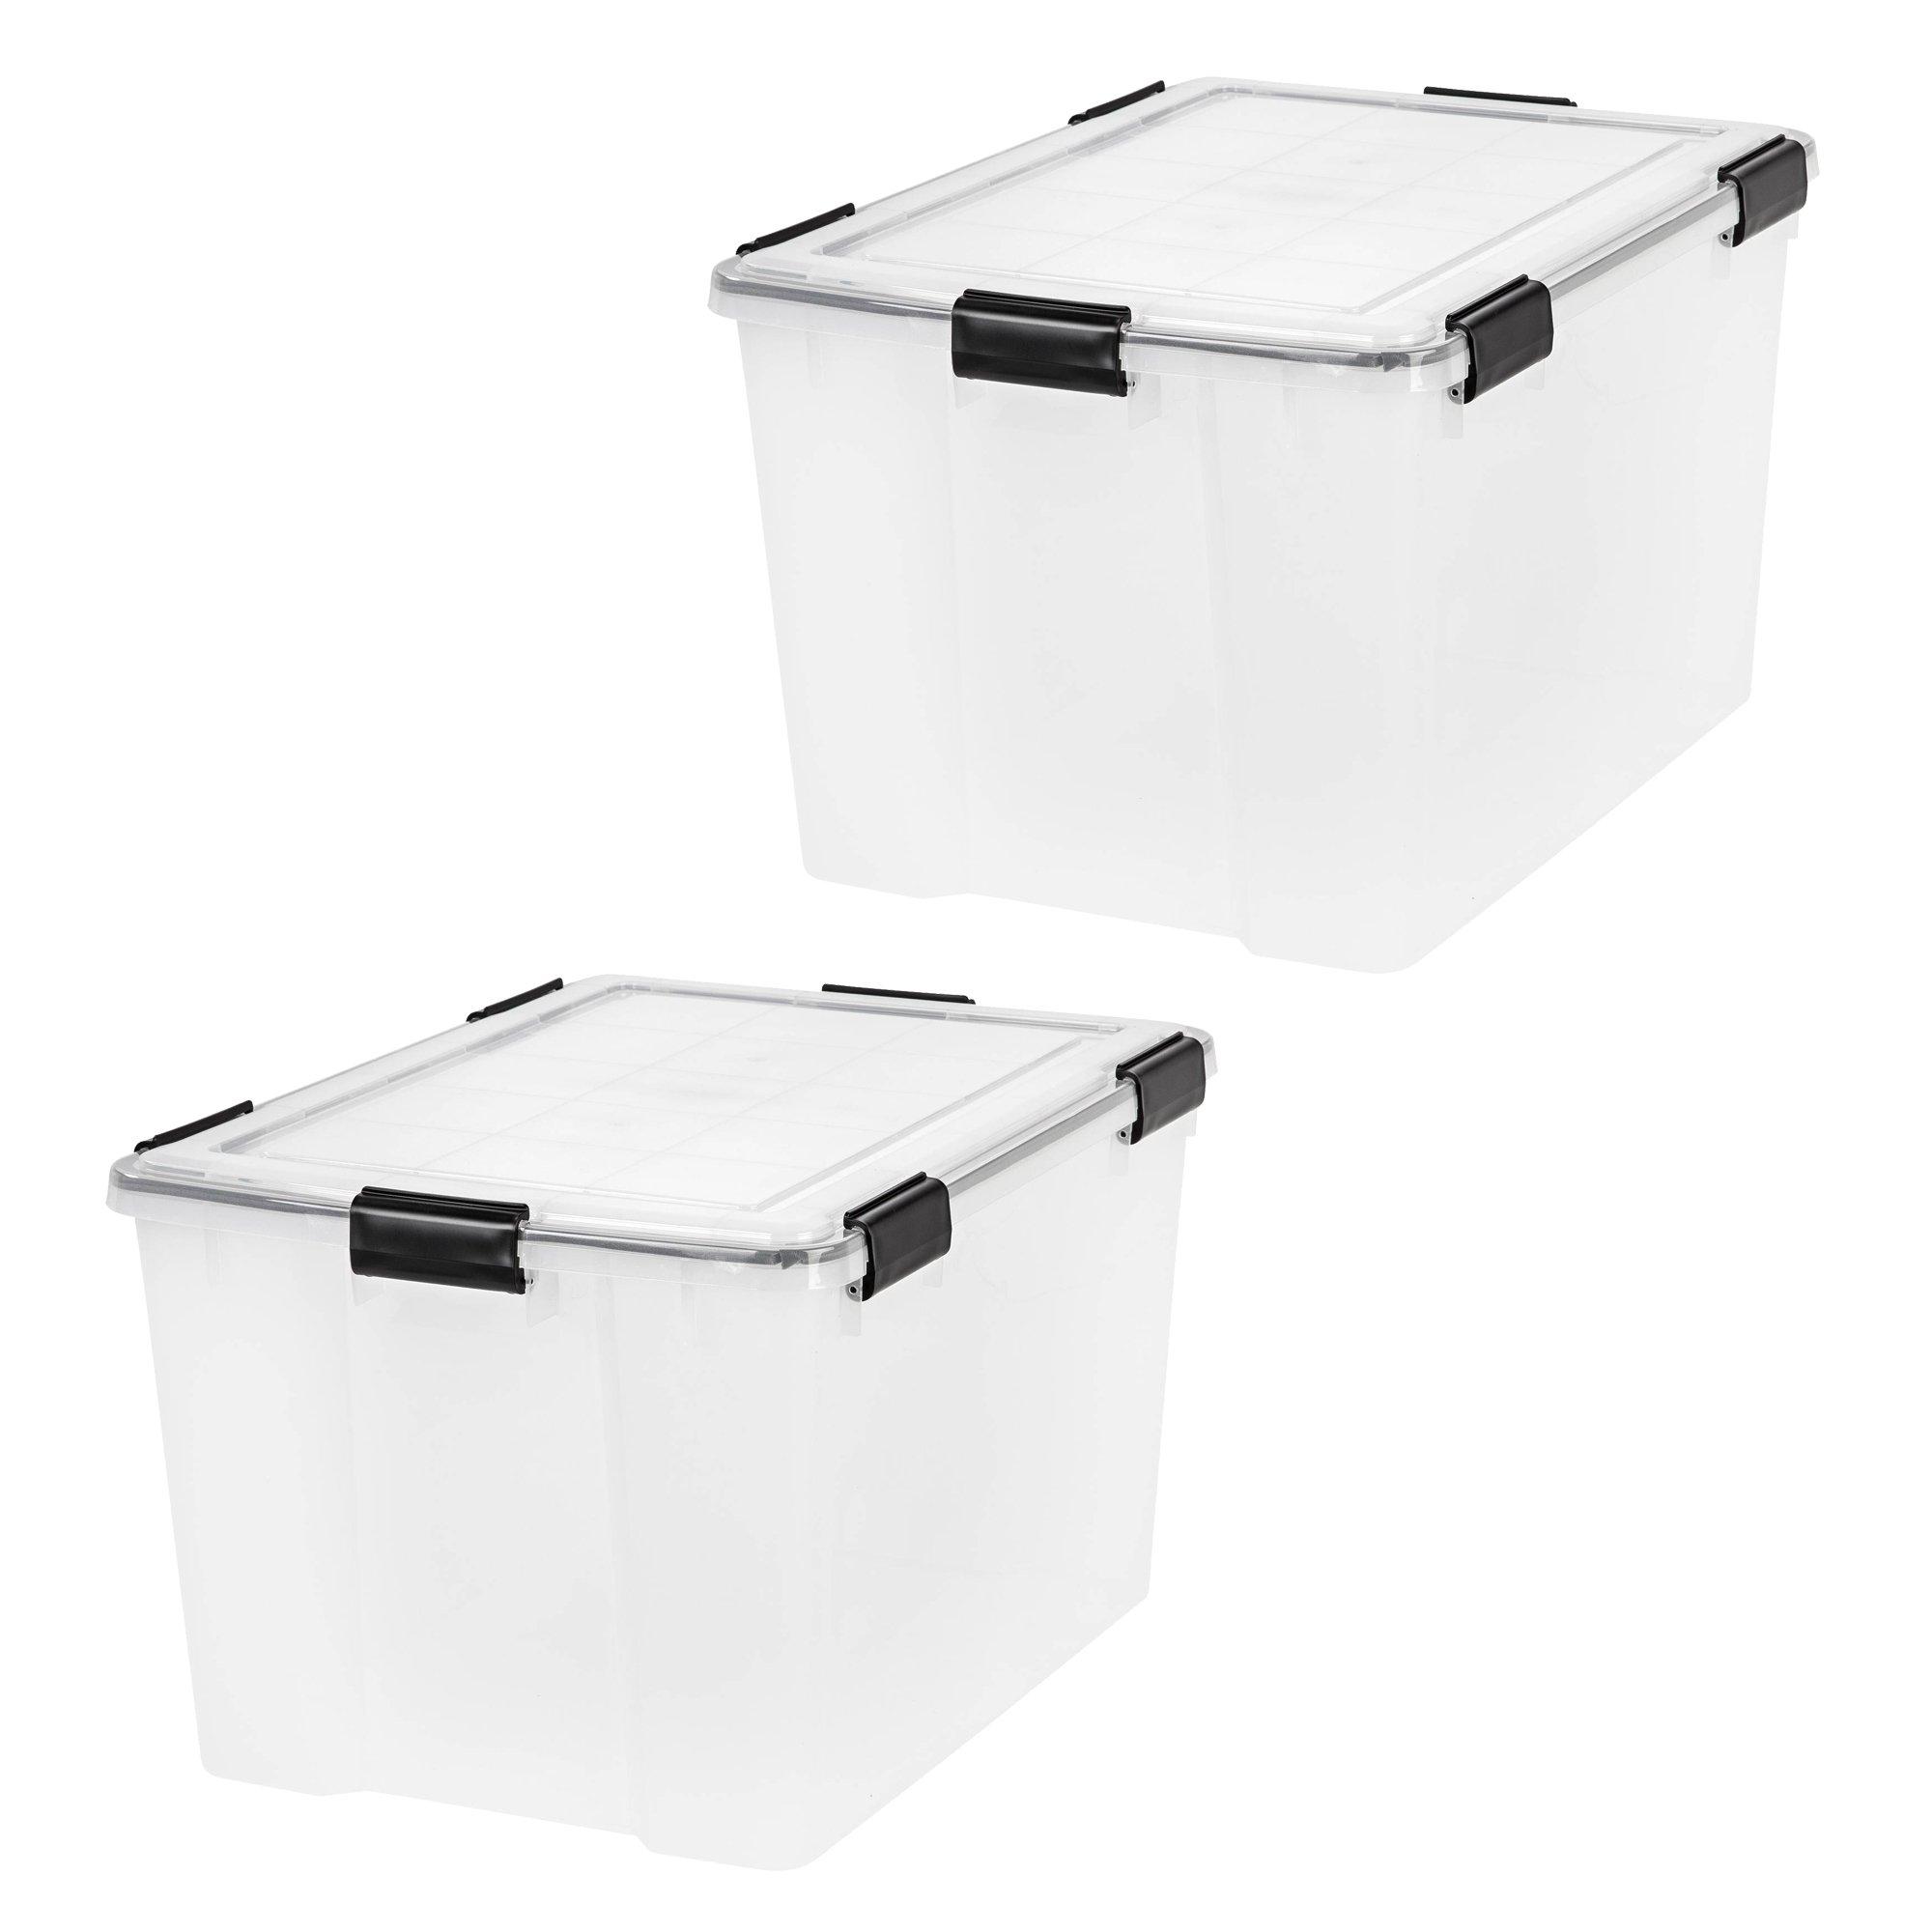 IRIS 74 Quart WEATHERTIGHT Storage Box, Clear, 2-Pack